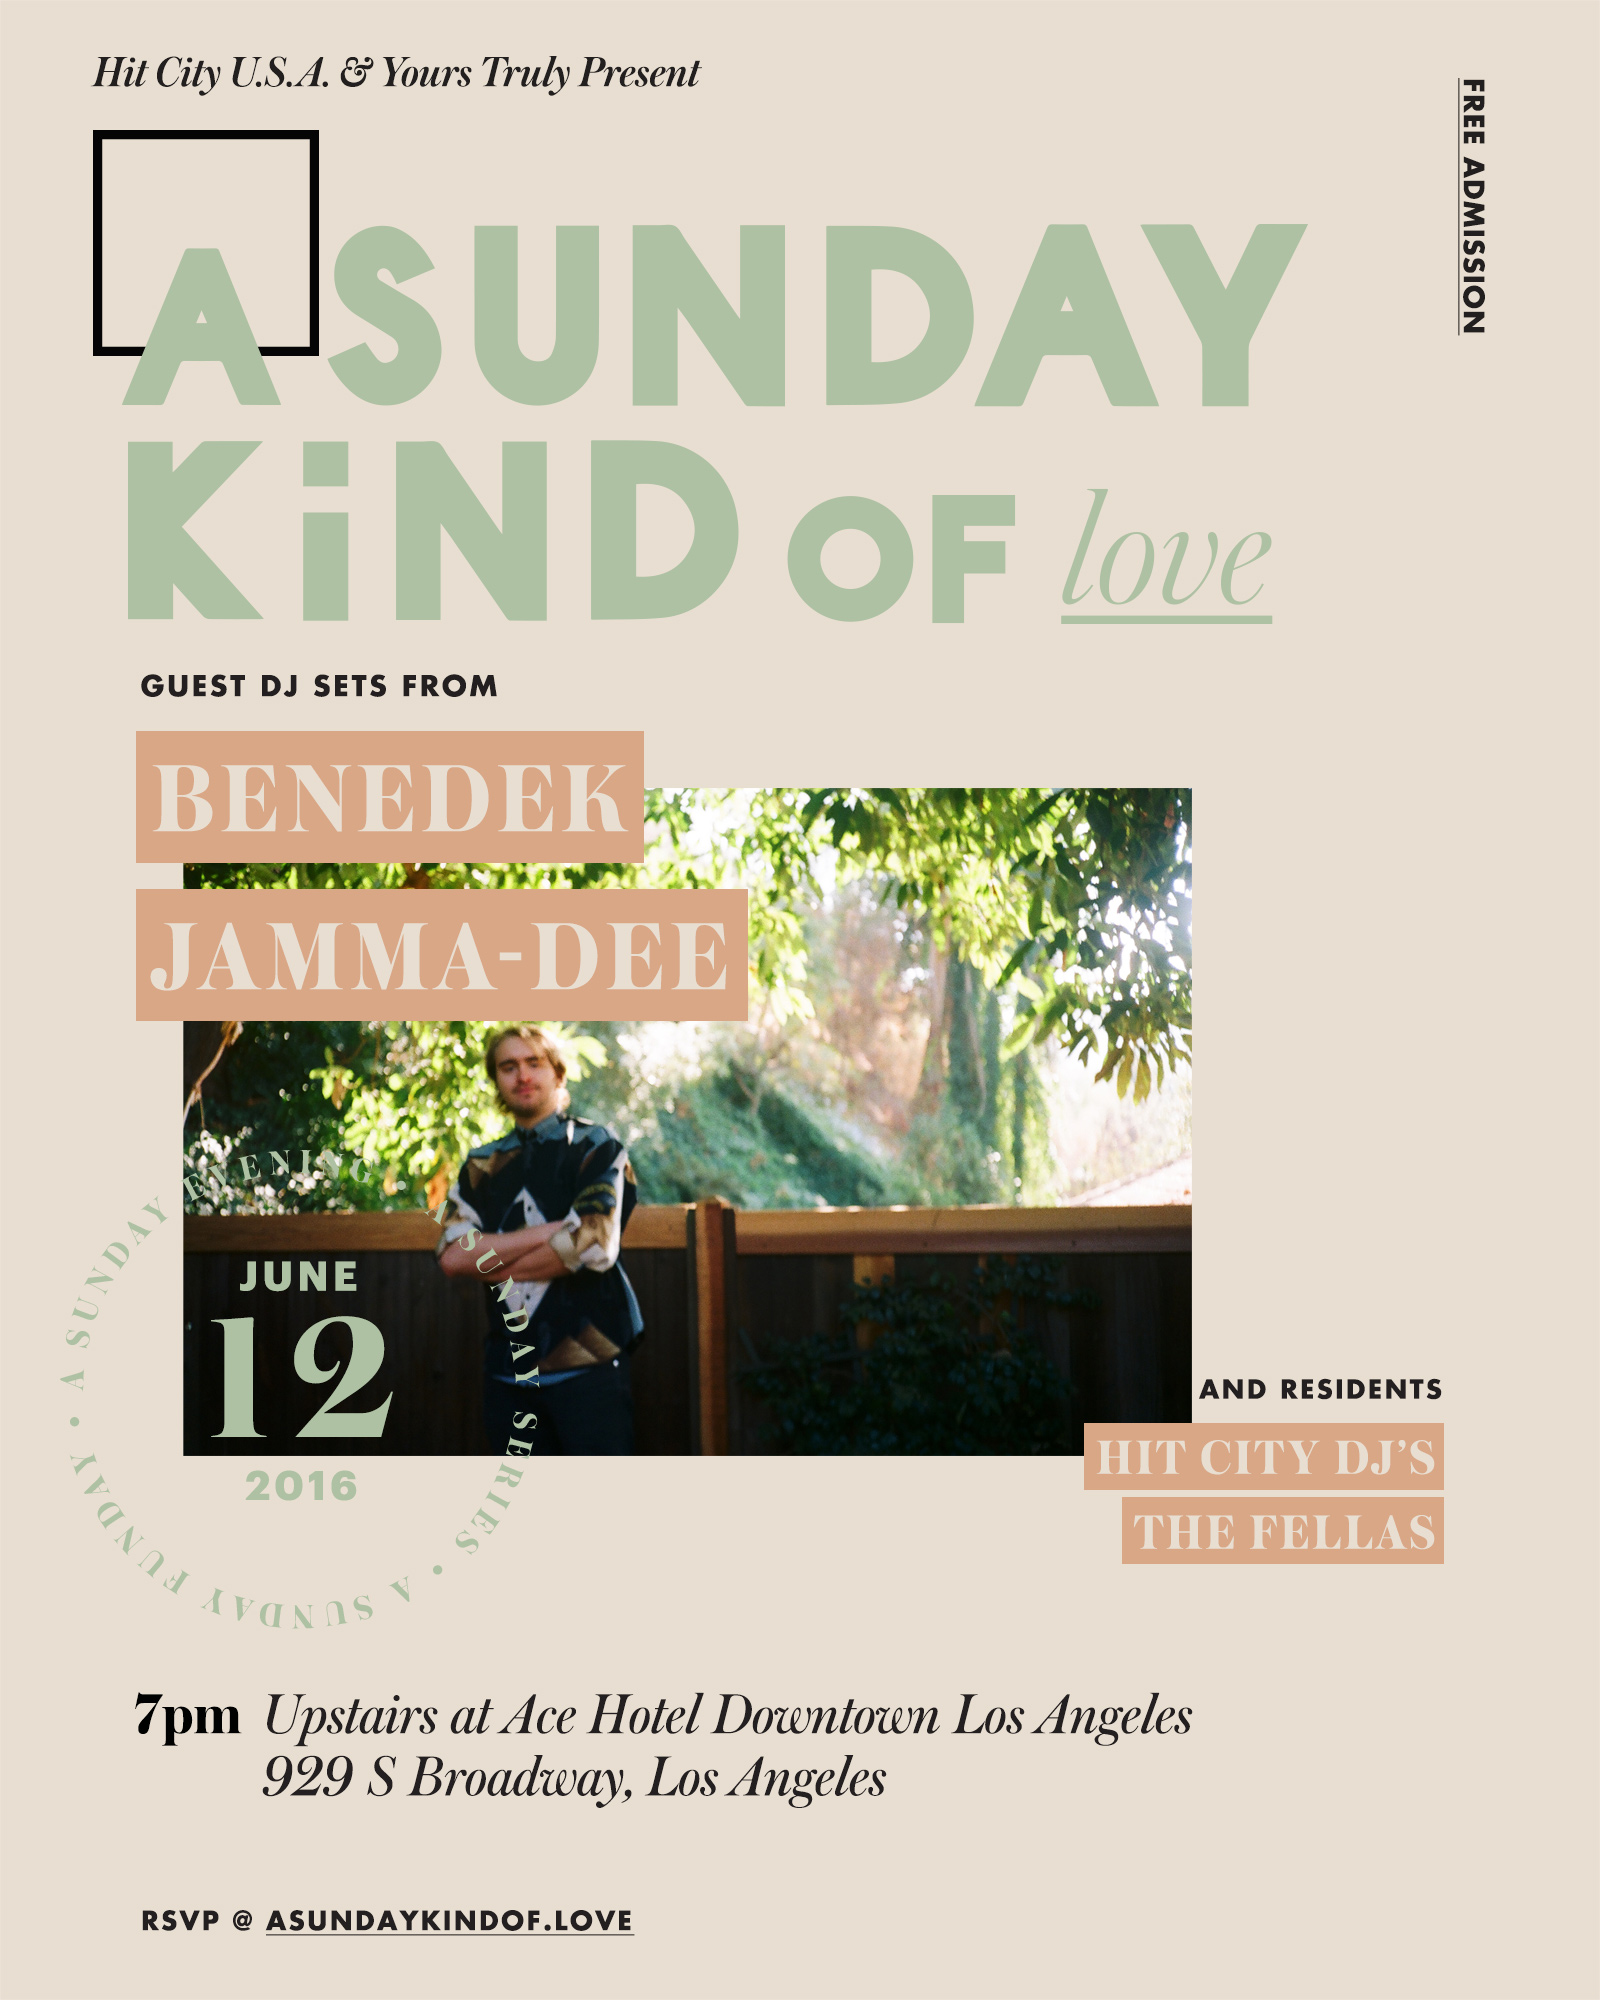 A Sunday Kind of Love w/ Benedek